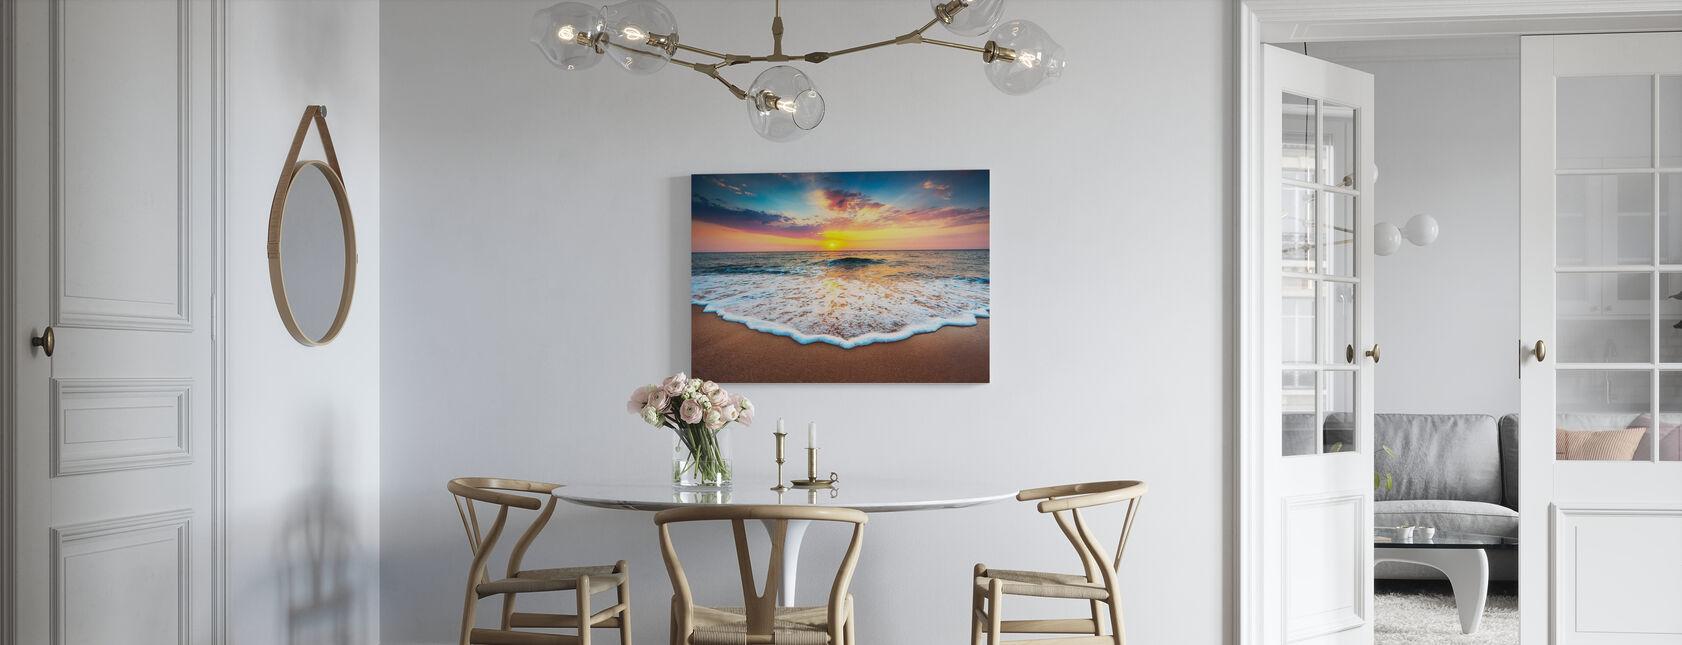 Sunrise and Dreams - Canvas print - Kitchen